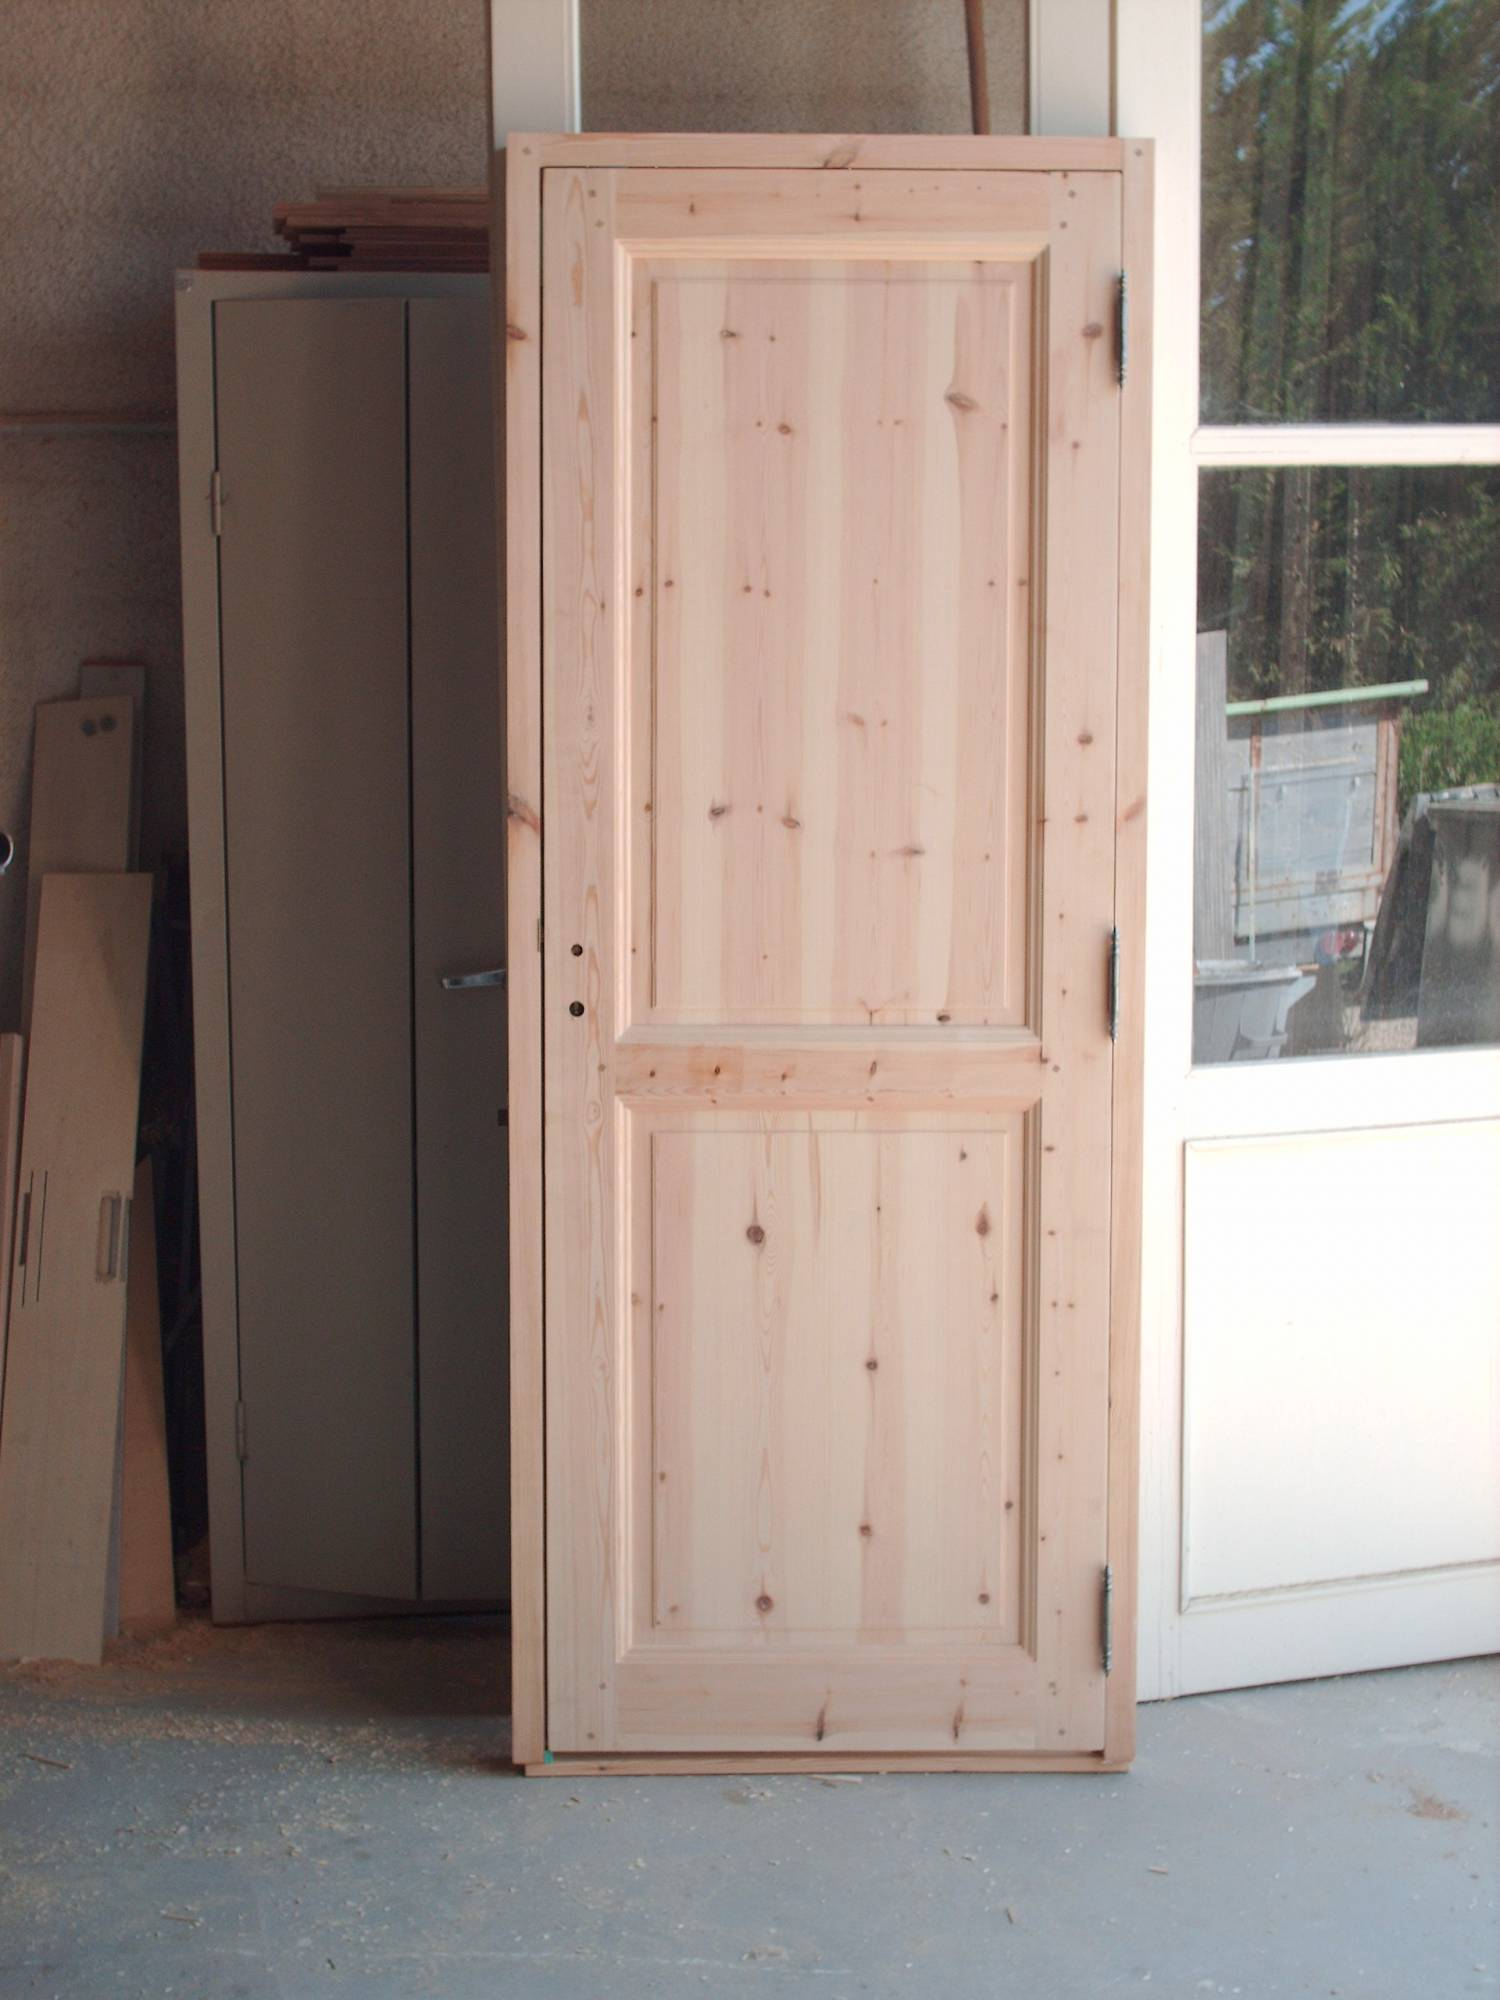 fabricant de porte intrieure en bois pin sylvestre aix en provence